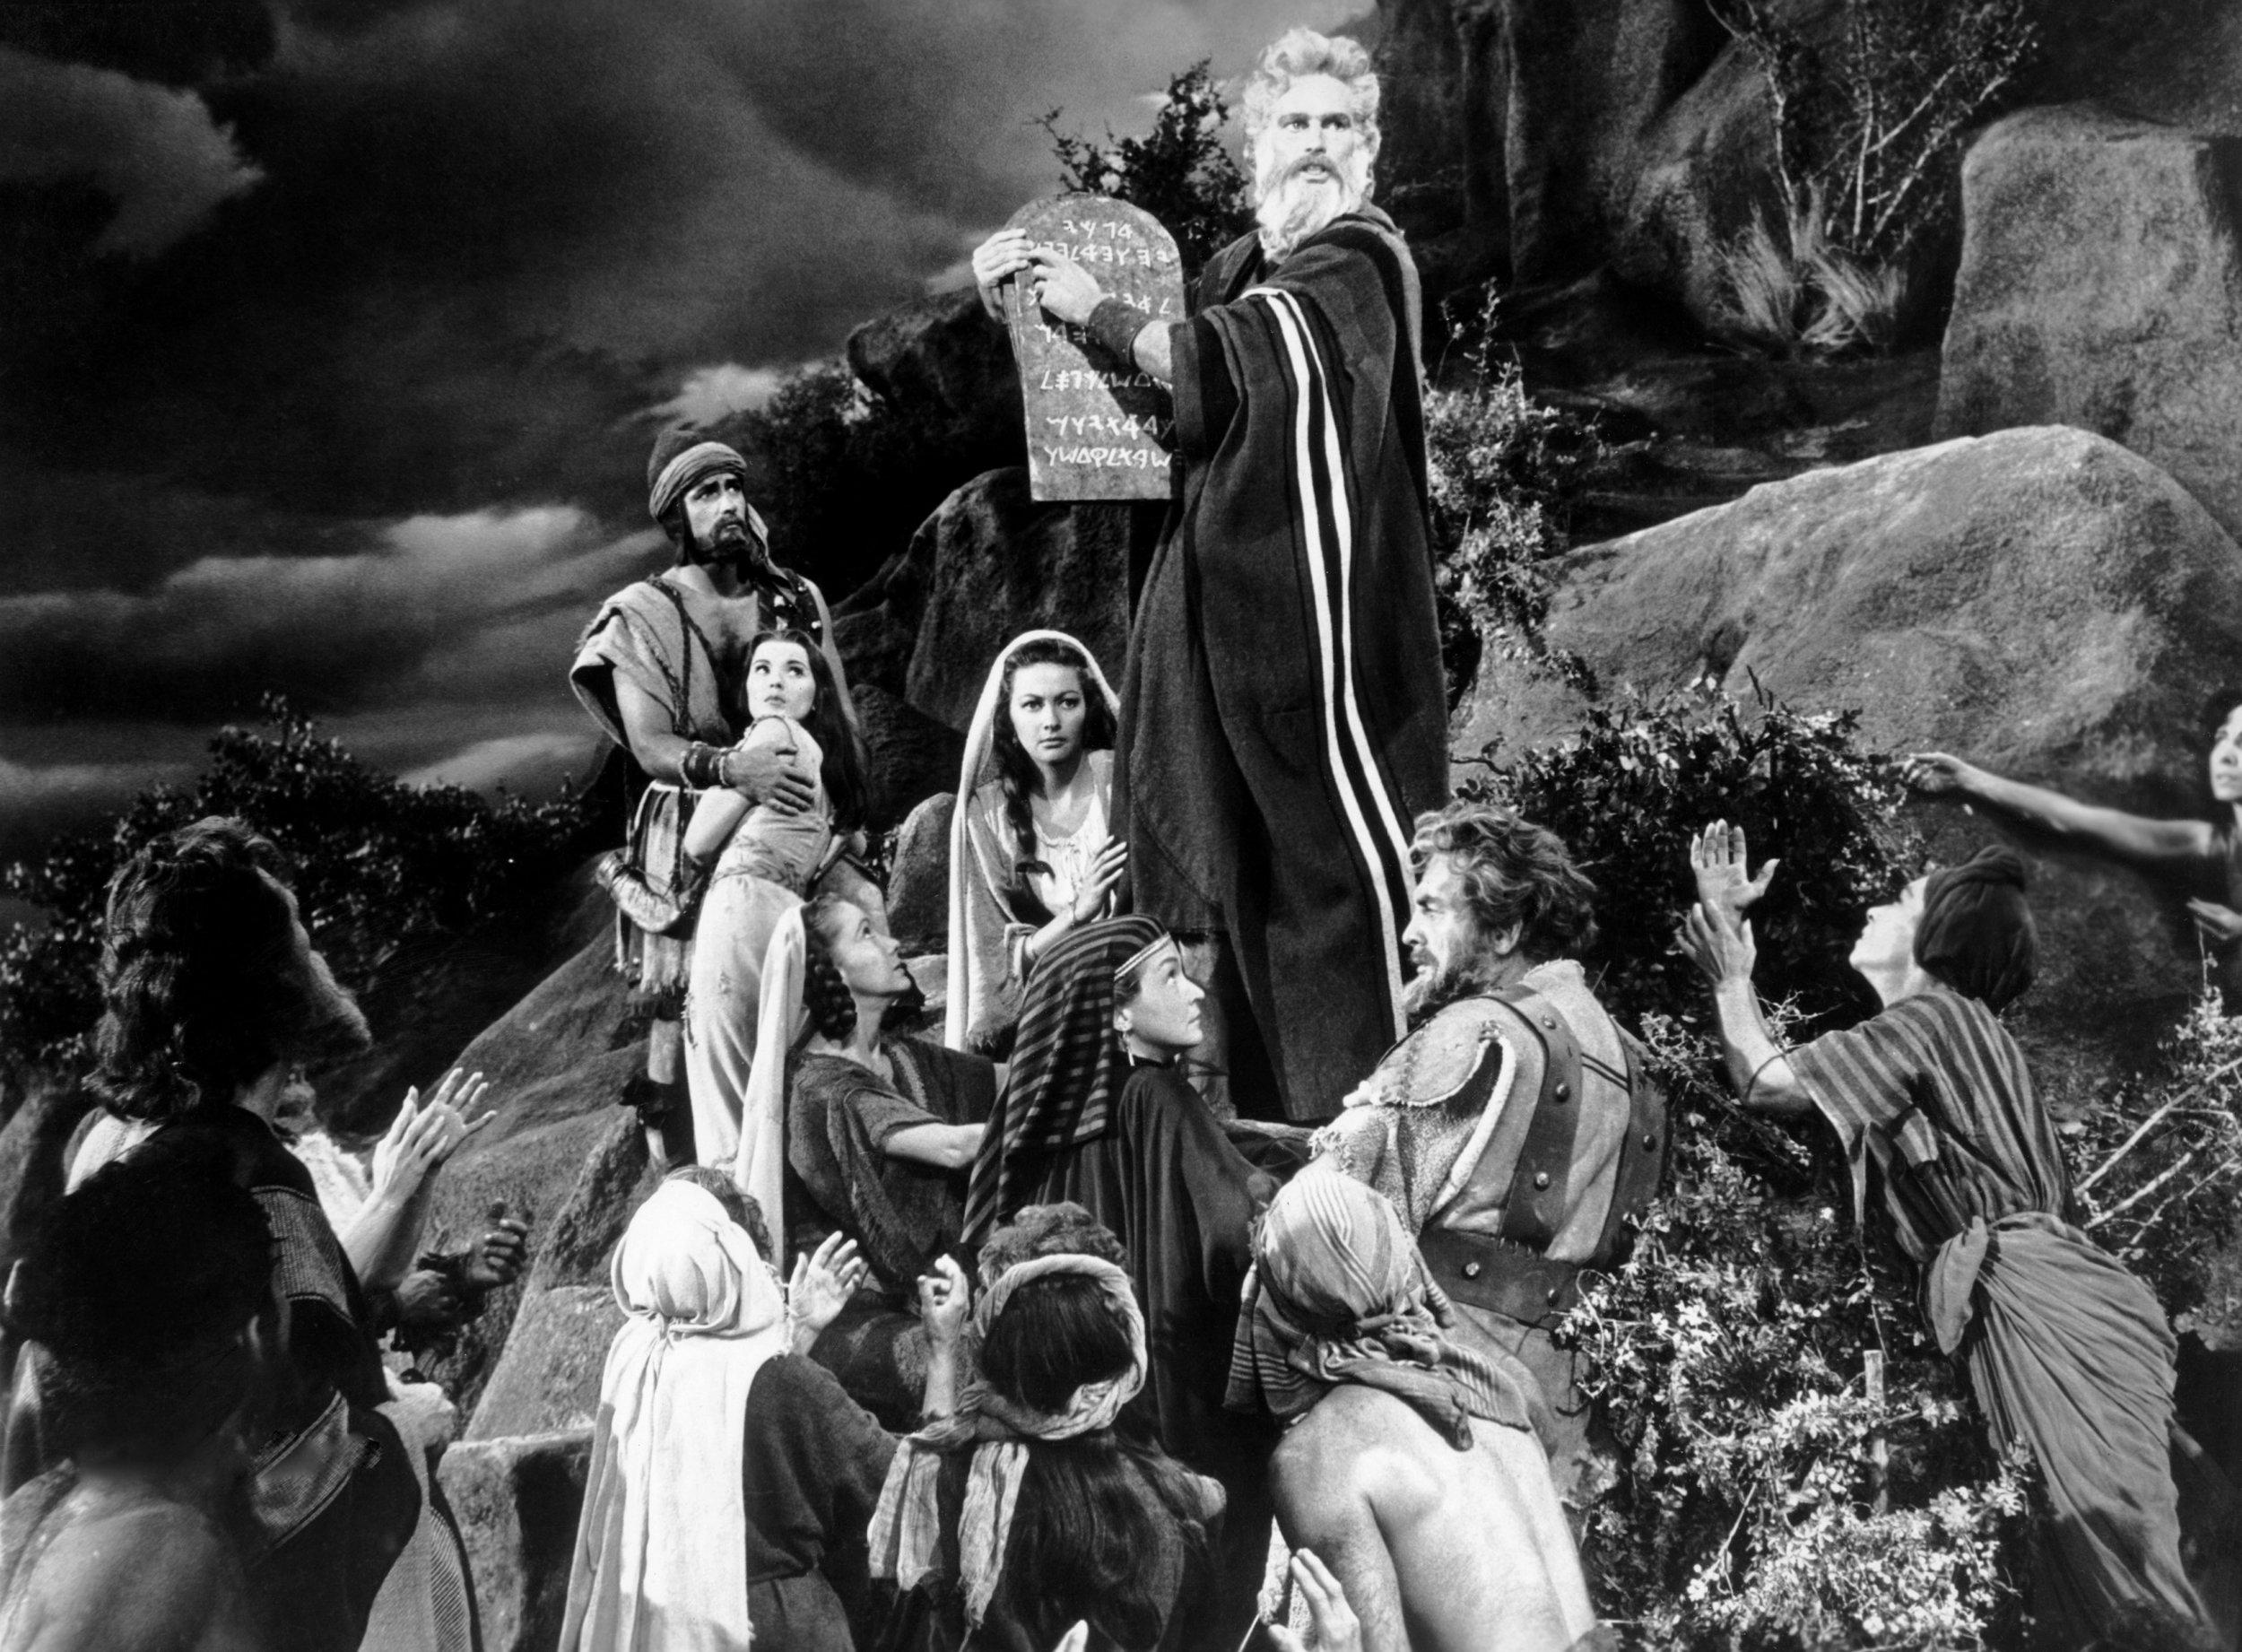 Heston from 10 Commandments